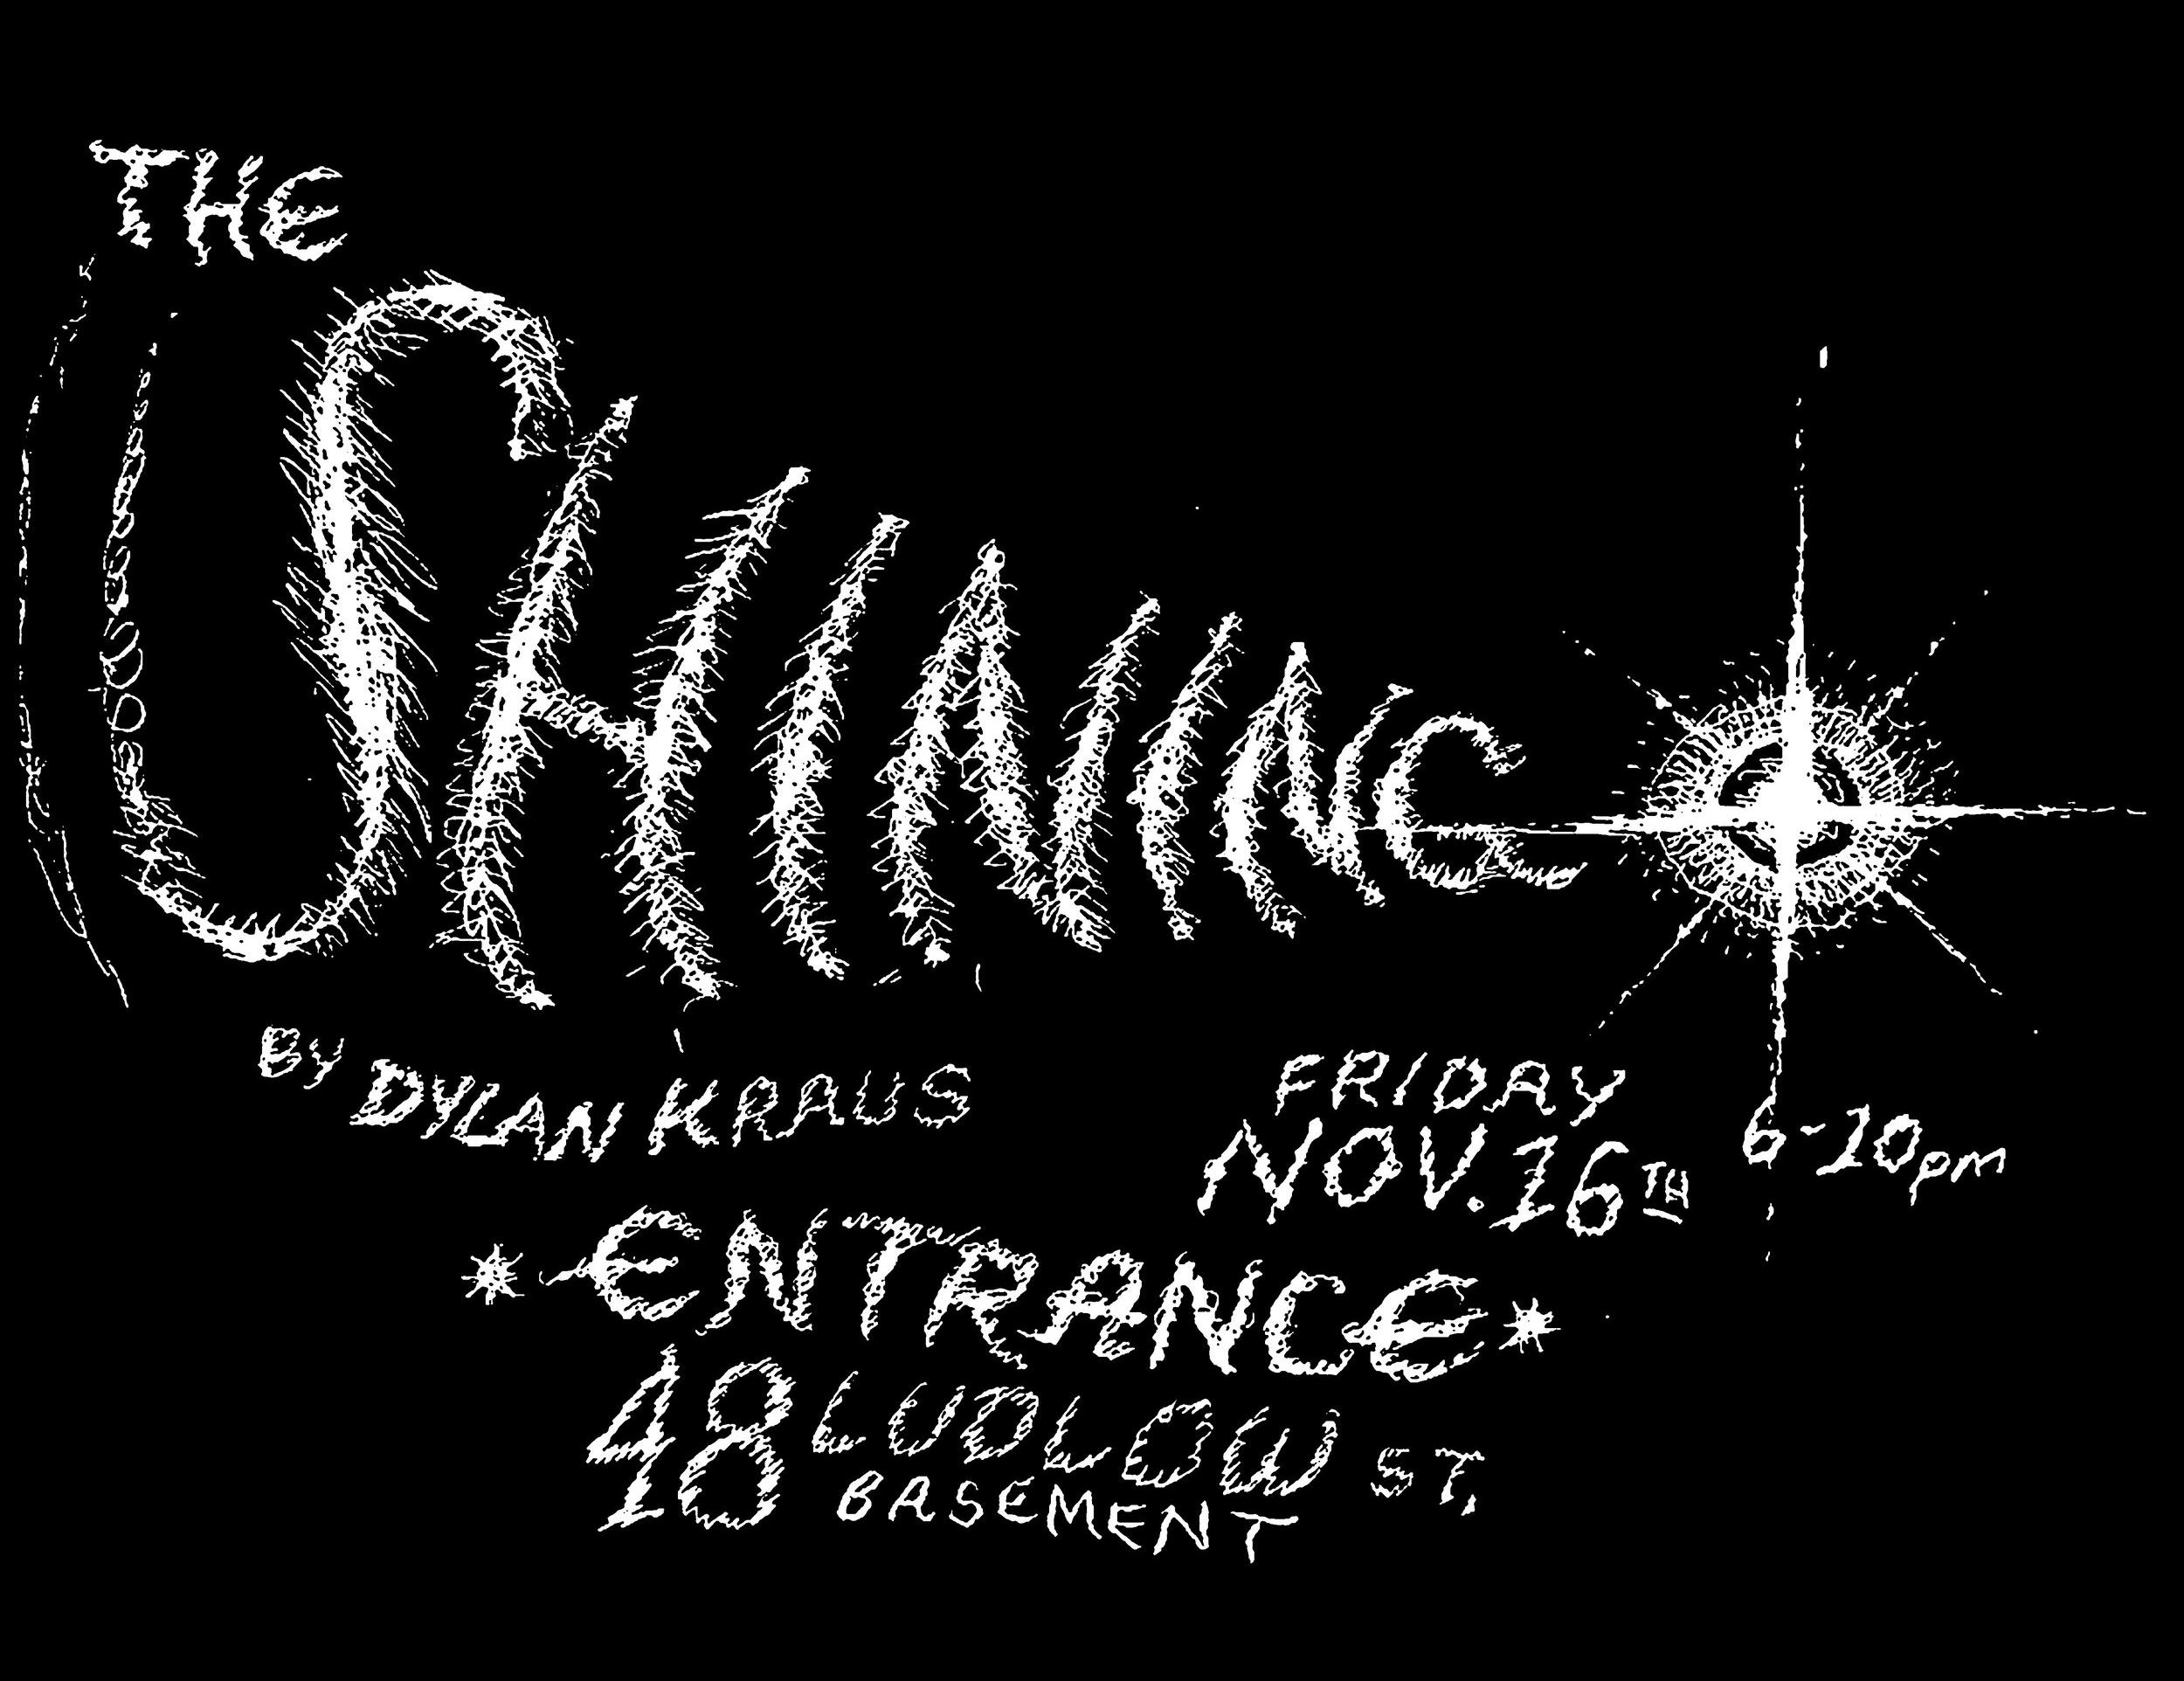 Dylan Kraus, The Shining  - November 16 - December 20, 2018Add to: Google Calendar iCal